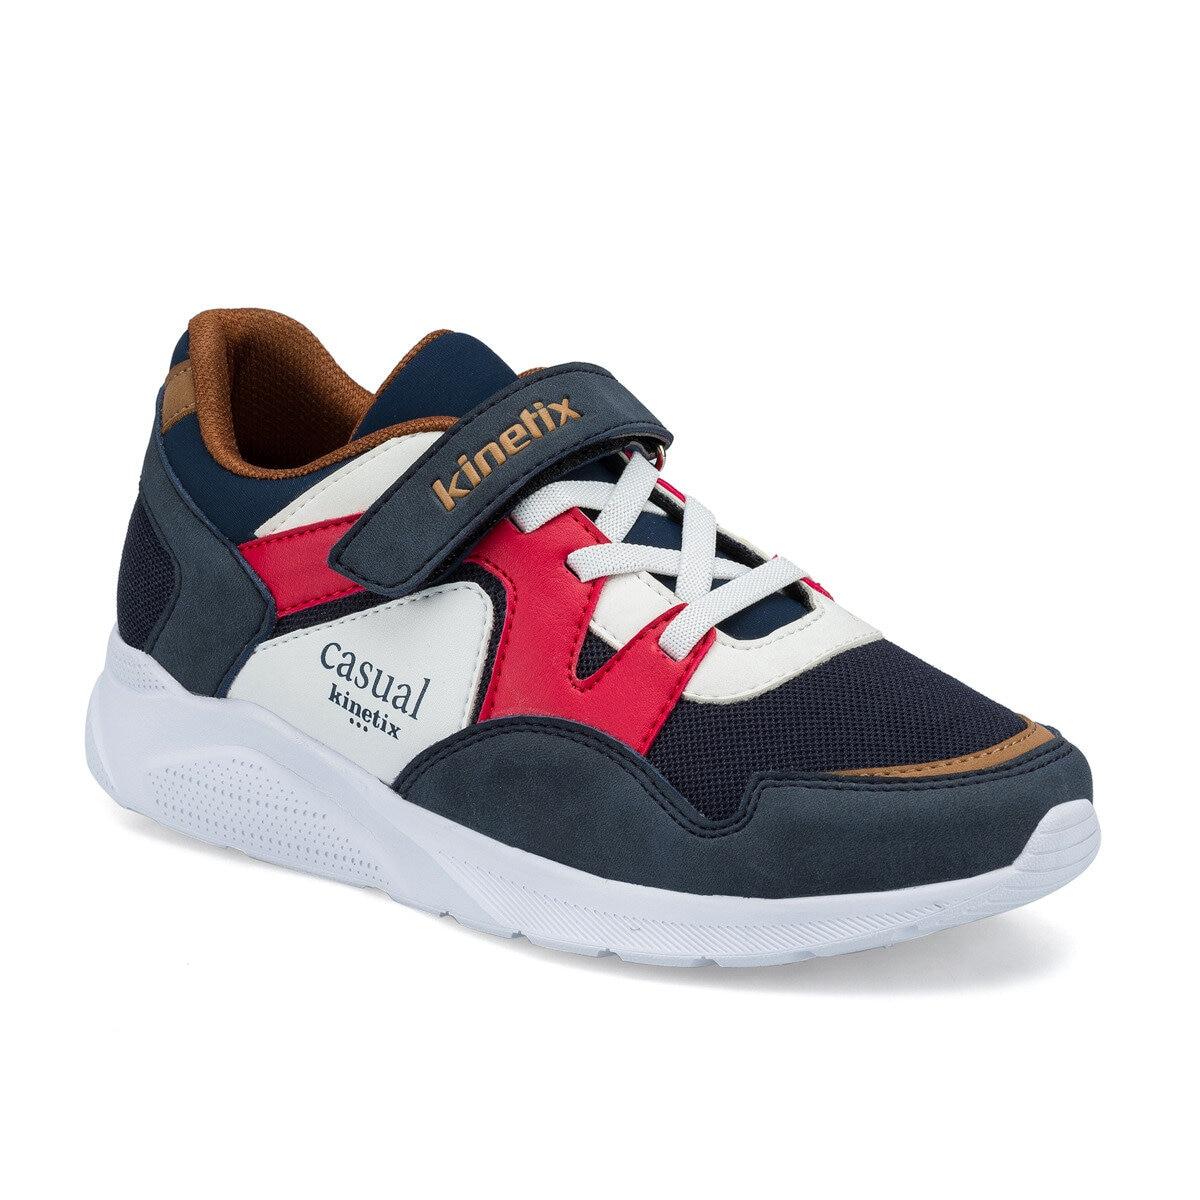 FLO RAYNELD Navy Blue Male Child Sneaker Shoes KINETIX